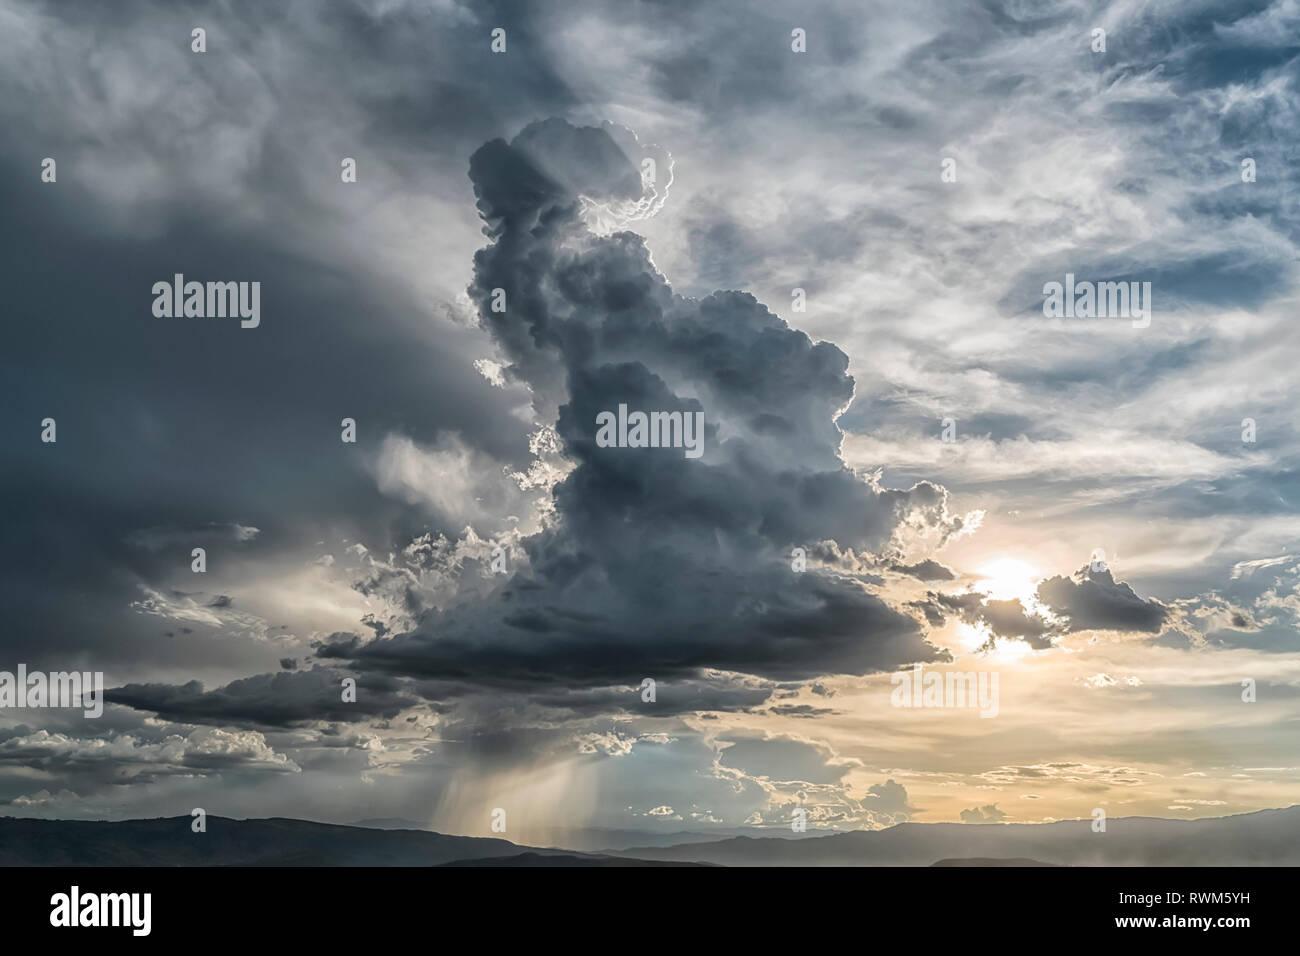 Cumulonimbus cloud building over the city of Cochabamba, Bolivia. Inspirational lighting coming from behind the cloud; Cochabamba, Bolivia - Stock Image